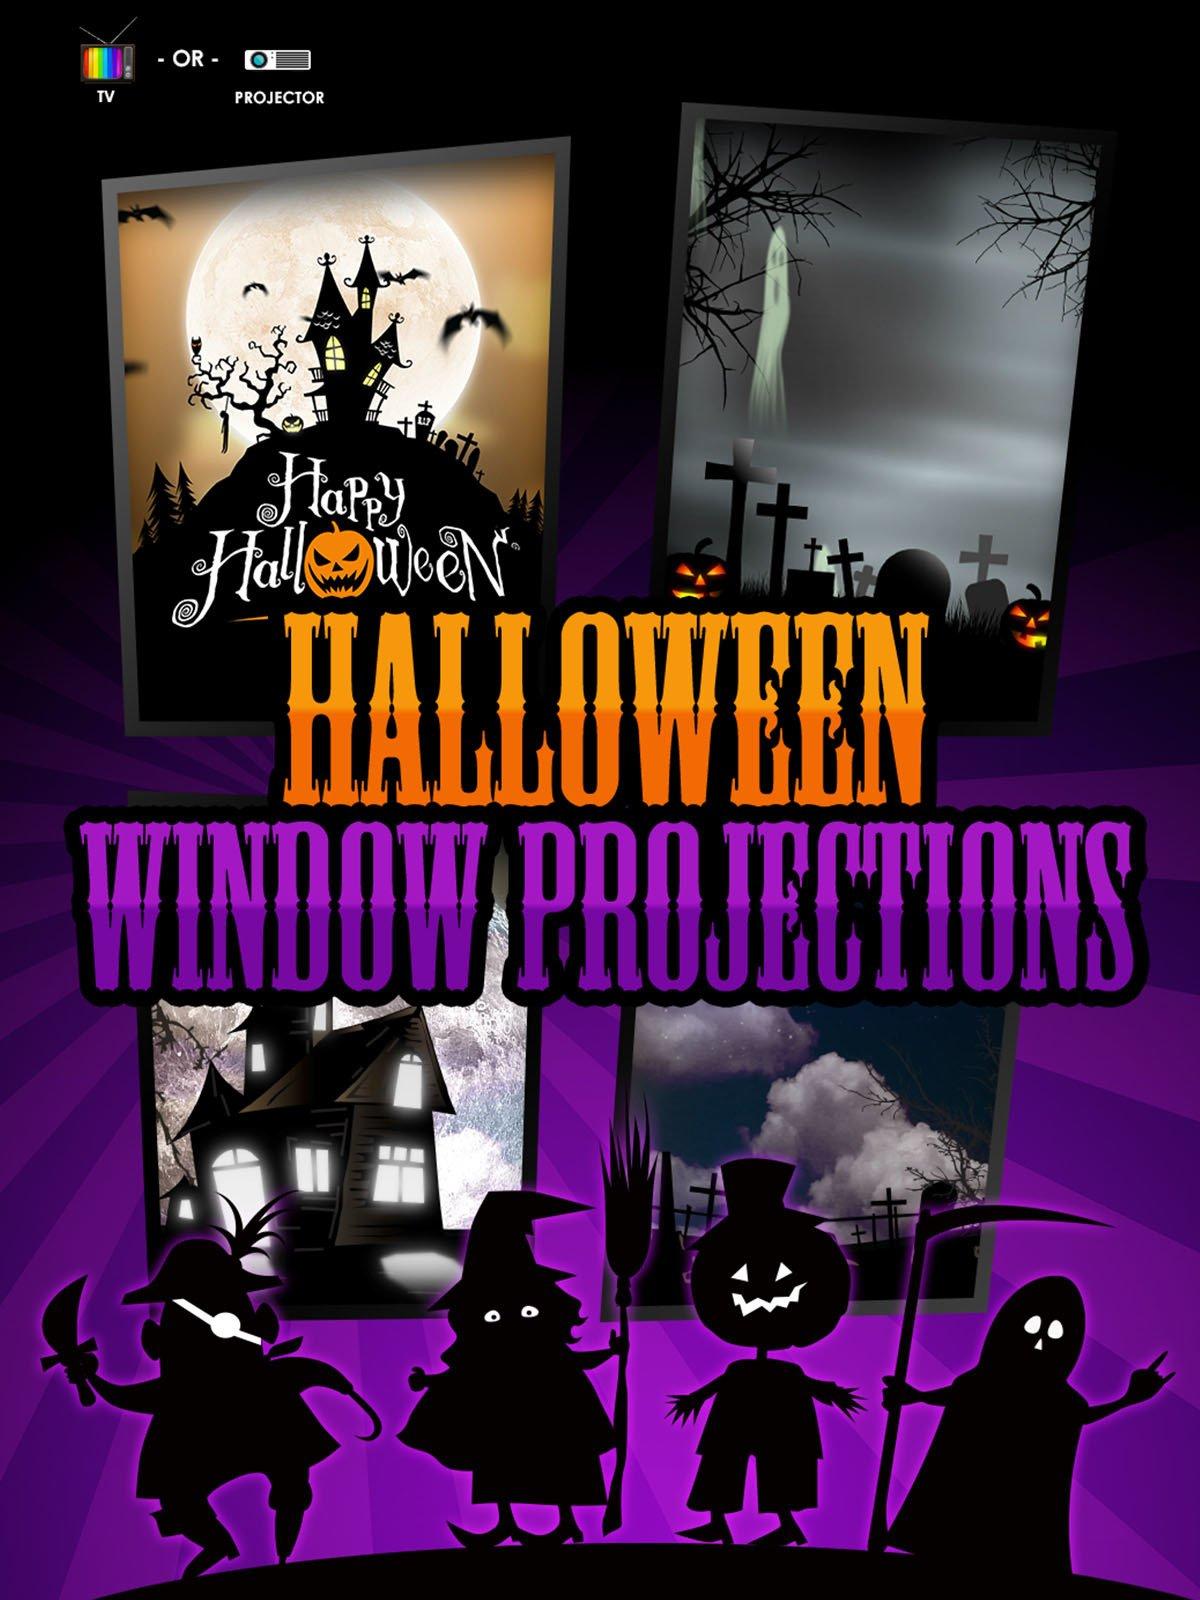 Halloween Window Projections